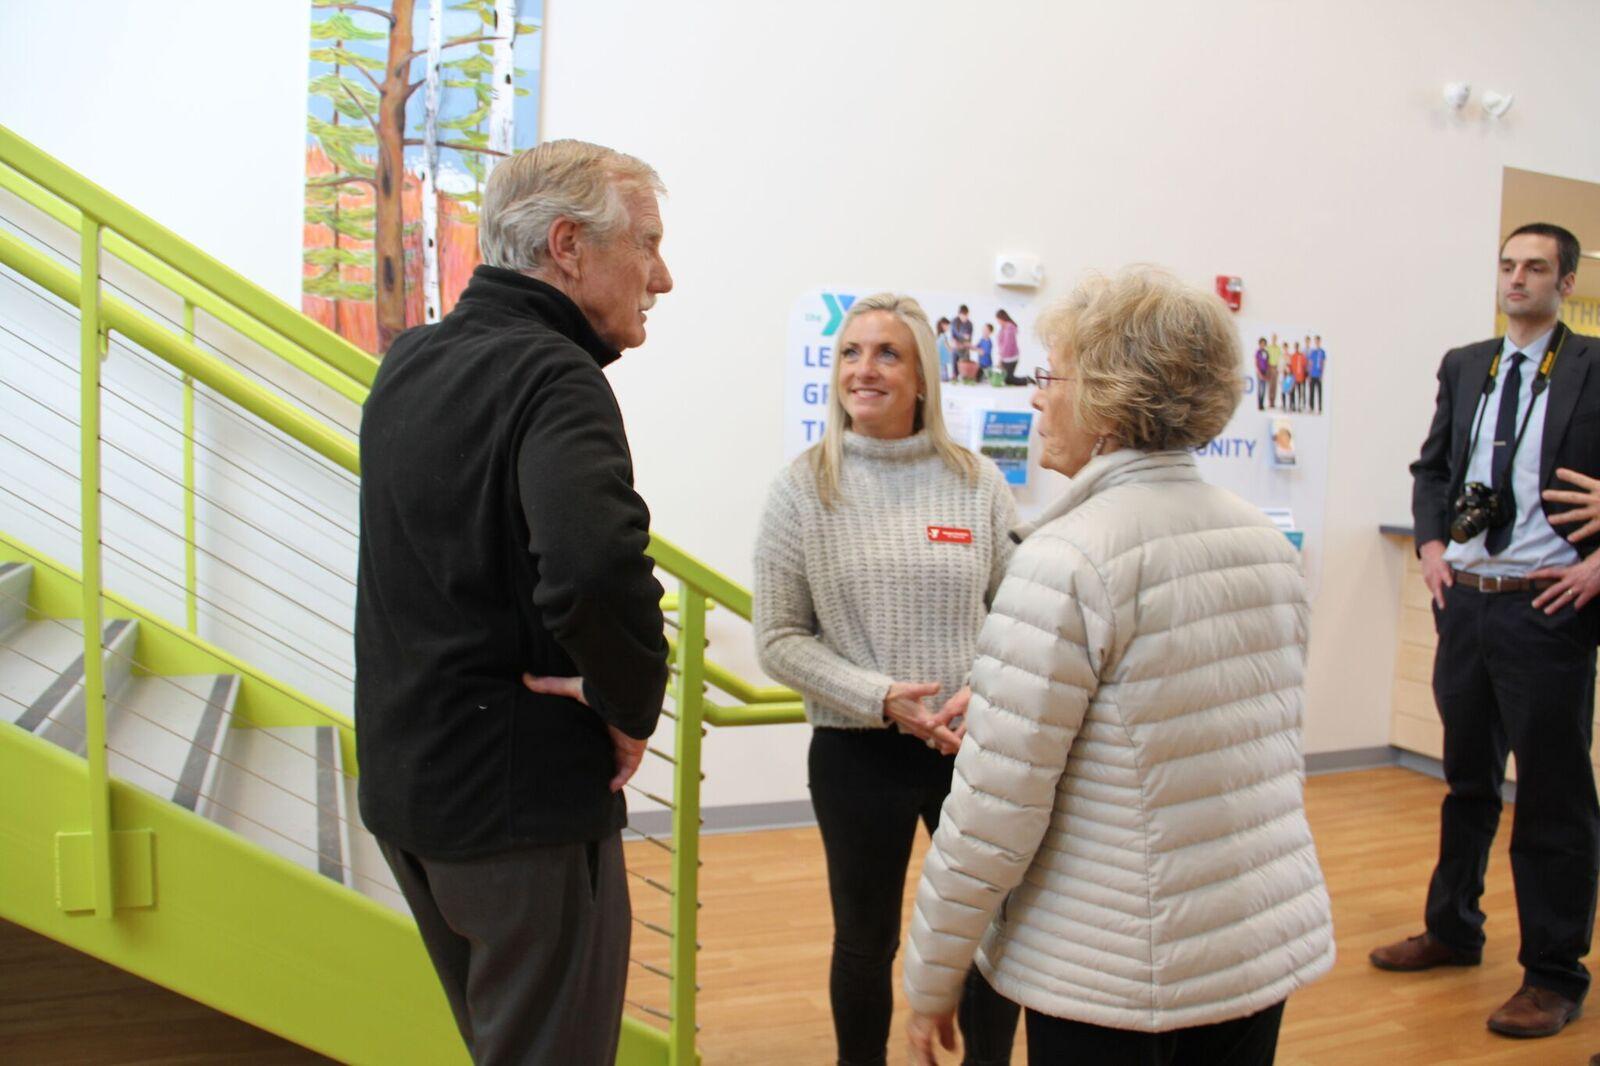 Senator Angus King of Maine, the YMCA's CEO Meagan Hamblett and a local artist.